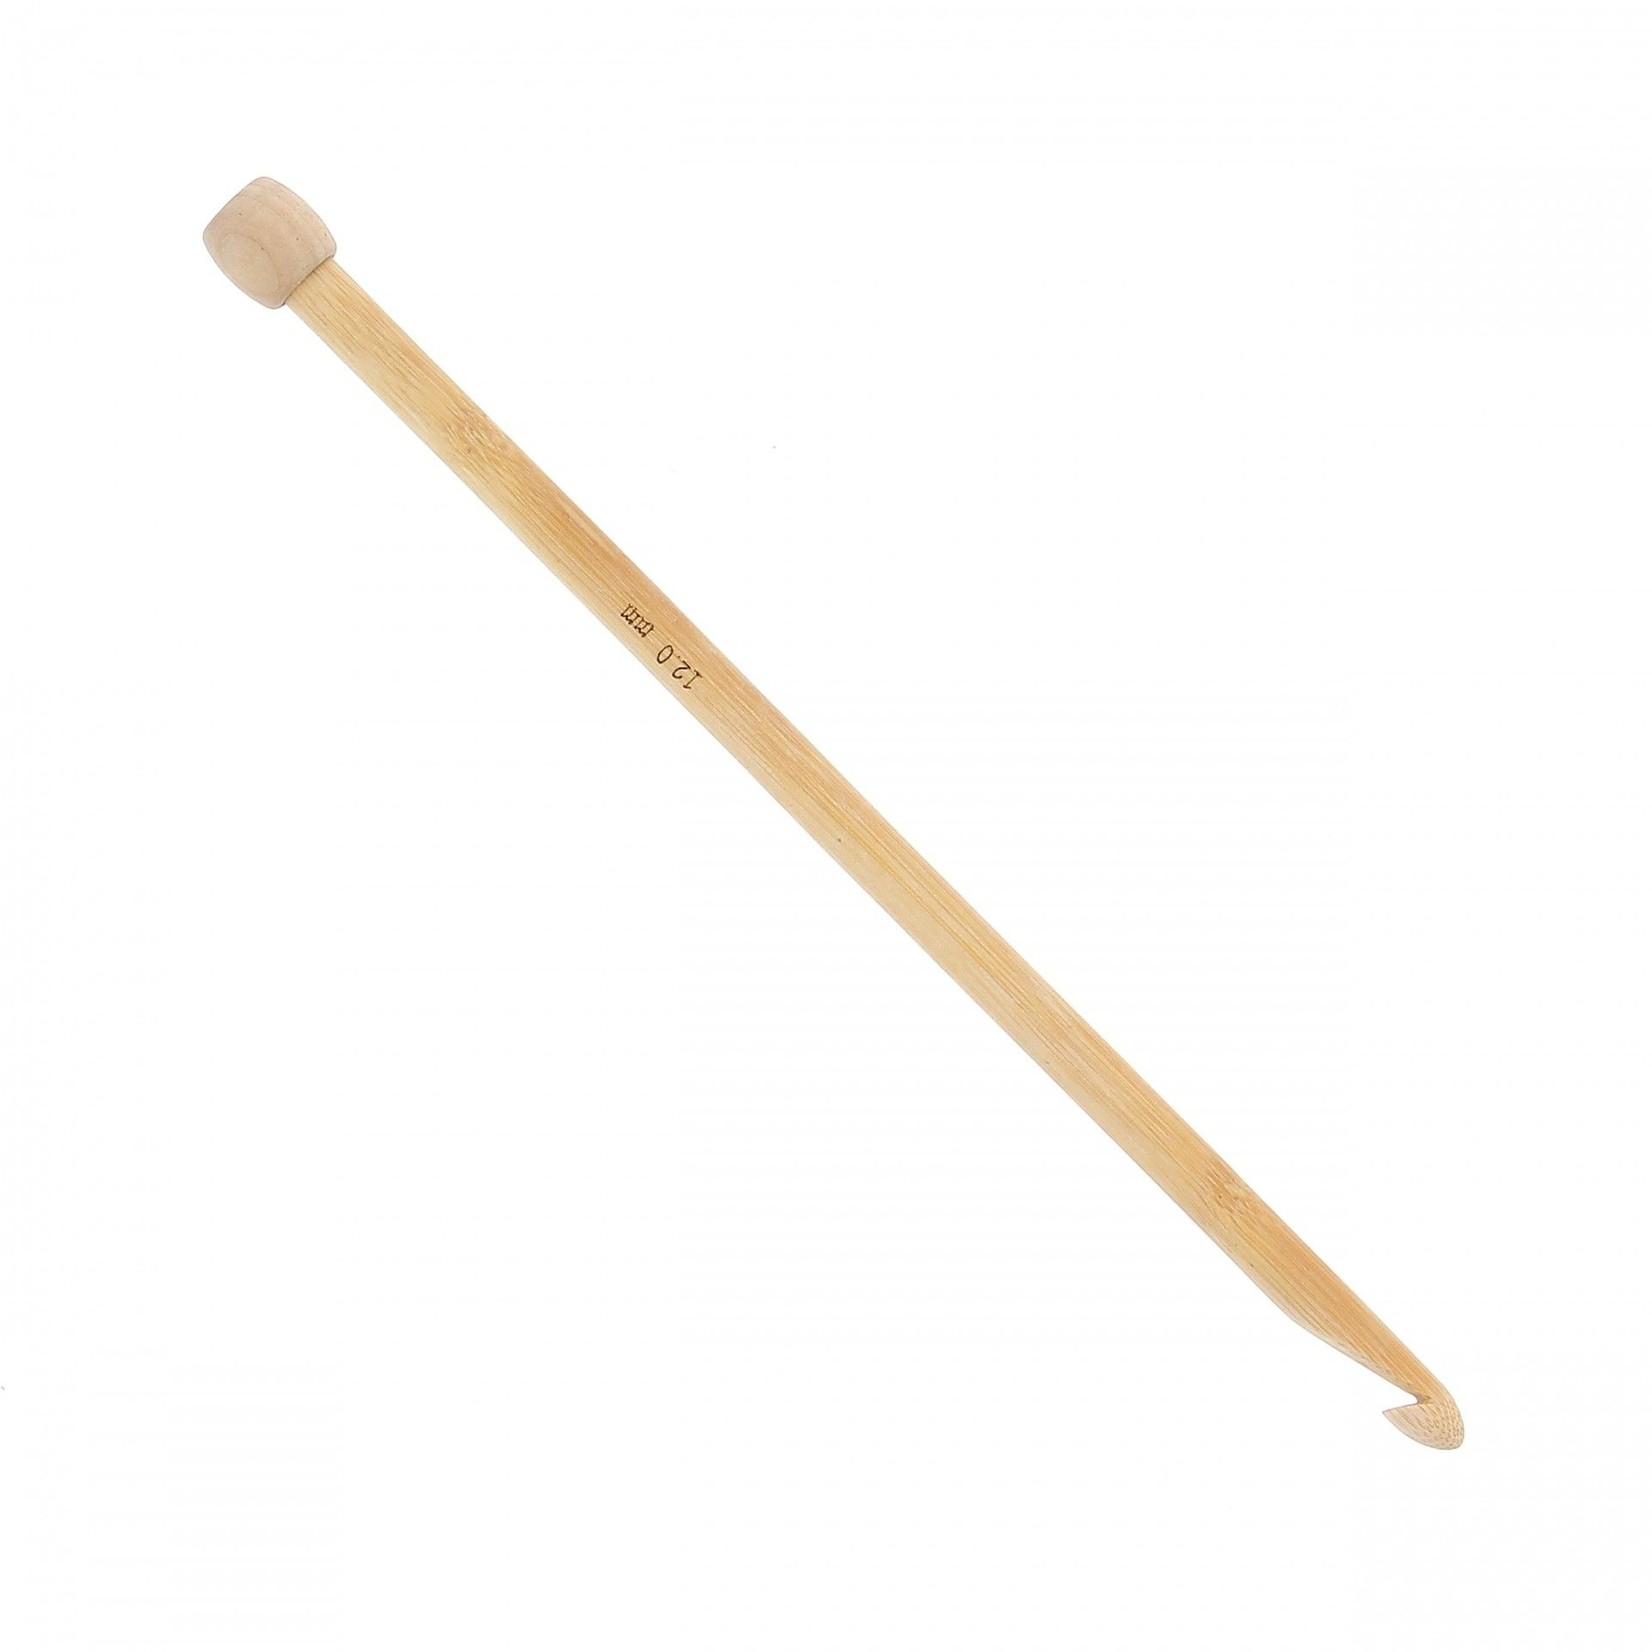 Hoooked Hoooked bamboe haaknaalden